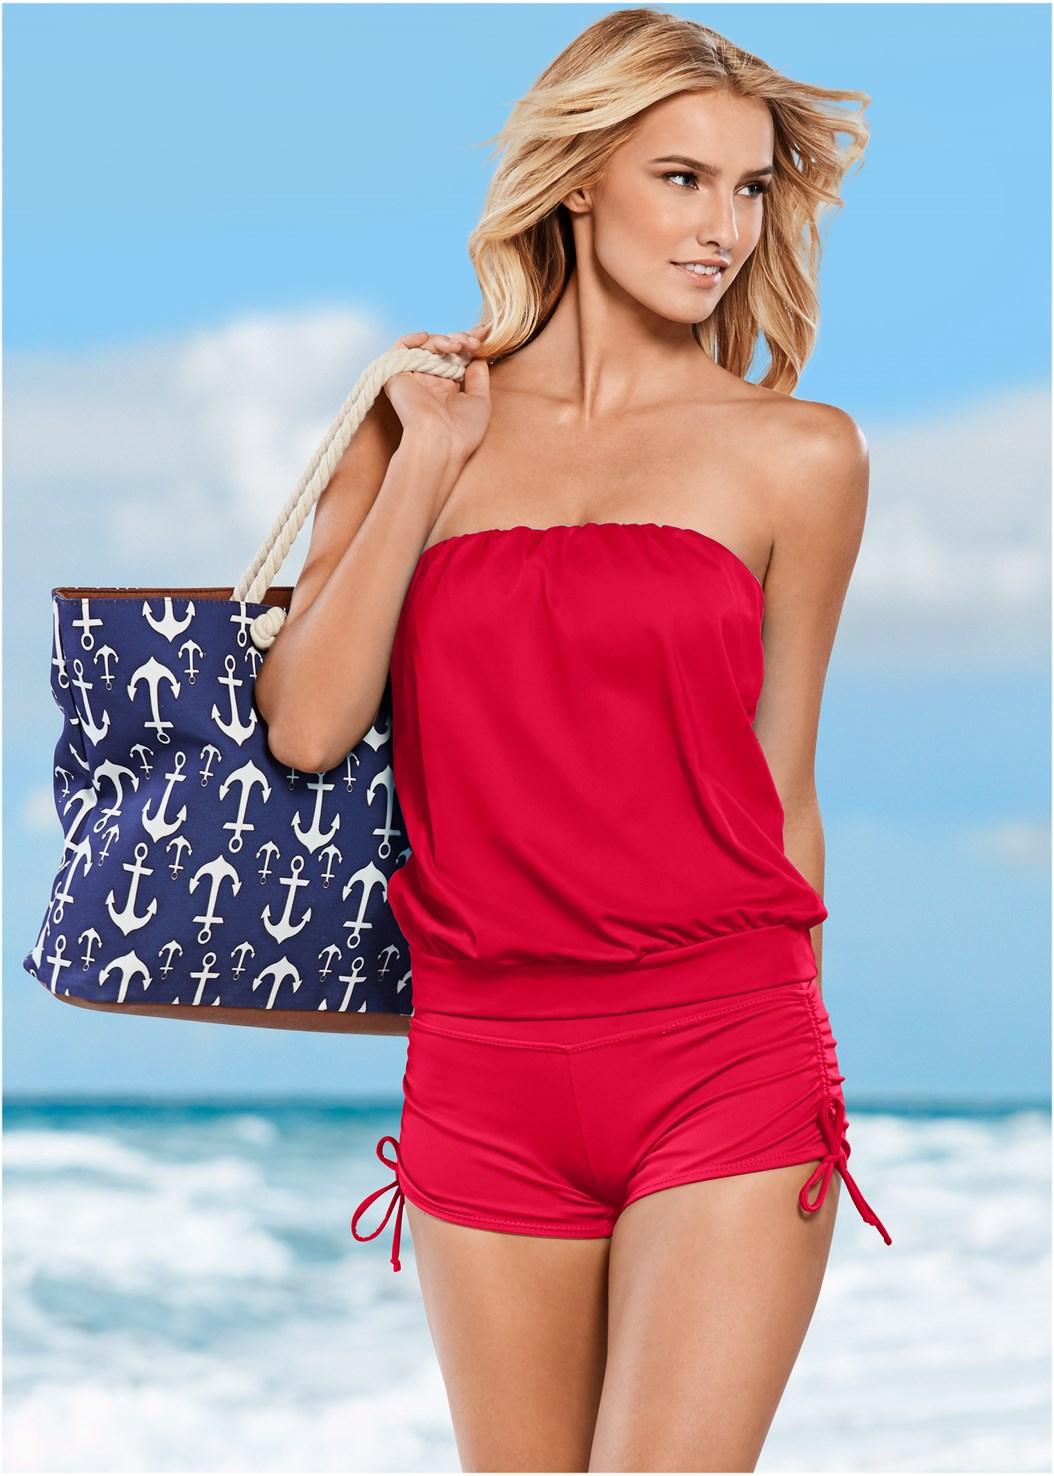 Blouson Bandeau Bikini Top,Adjustable Side Swim Short,Full Coverage Mid Rise Hipster Bikini Bottom,Low Rise Bikini Bottom,Bandeau Maxi Dress Cover-Up